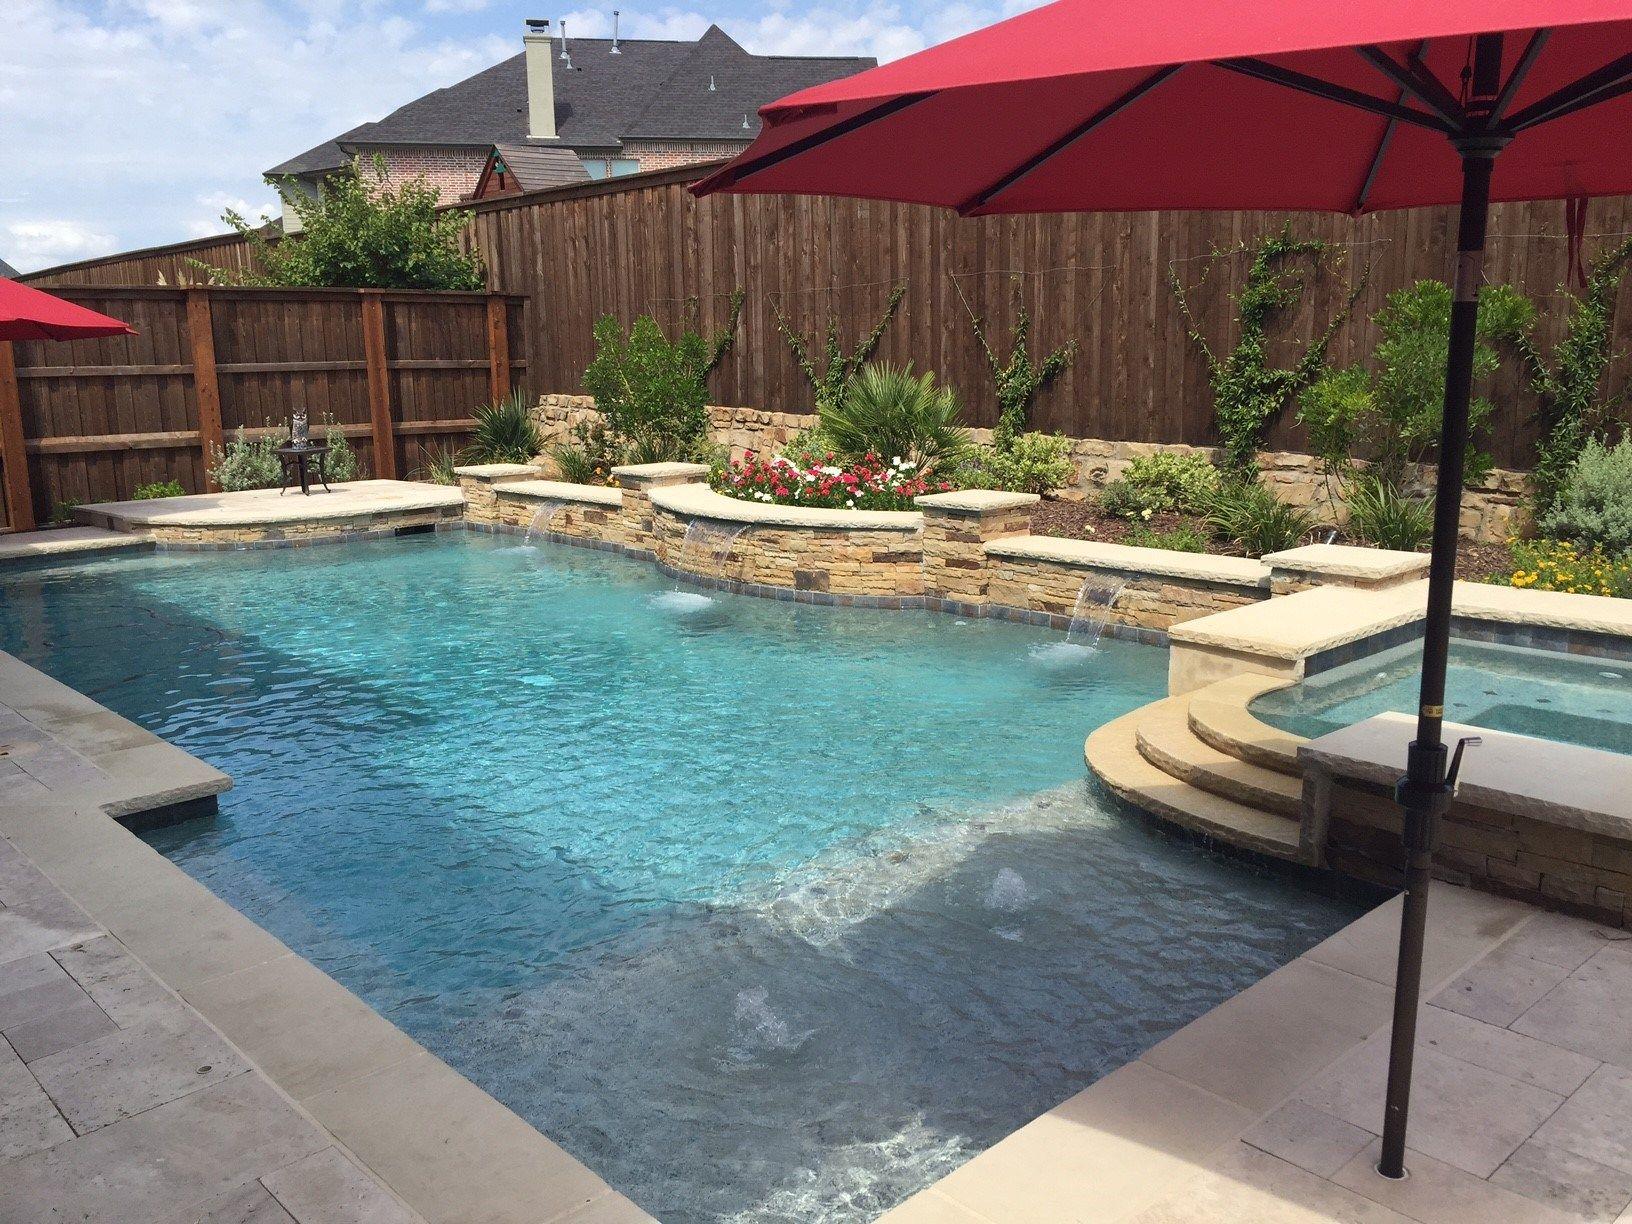 gunite pool designs cold spring harbor gunite pool u0026 spa i do